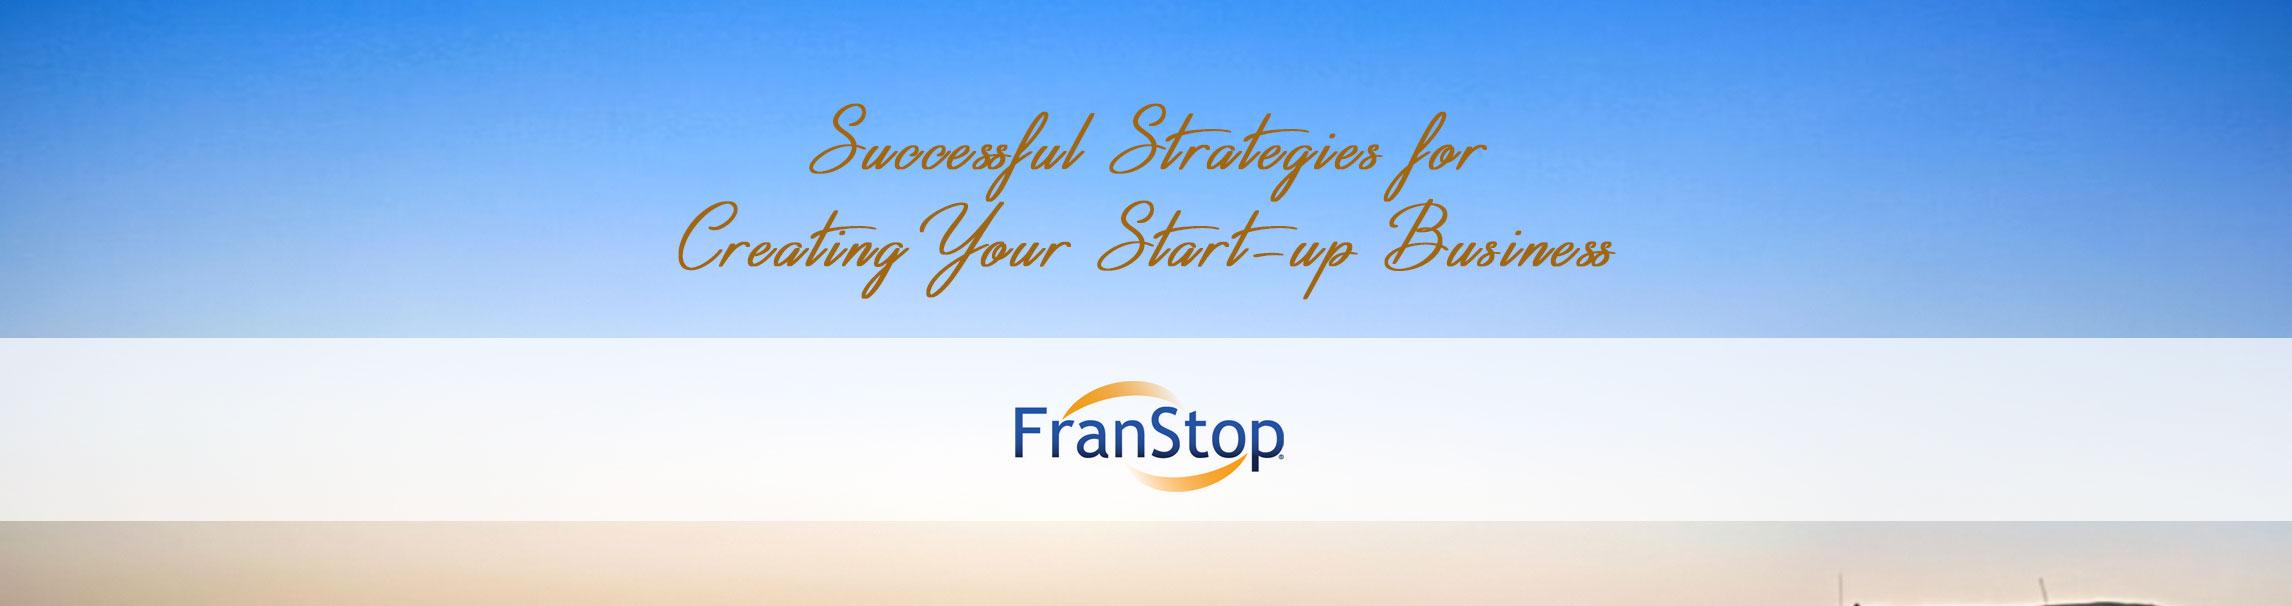 FranStop_Franchise_Business_Buy_Sell_For_Sale